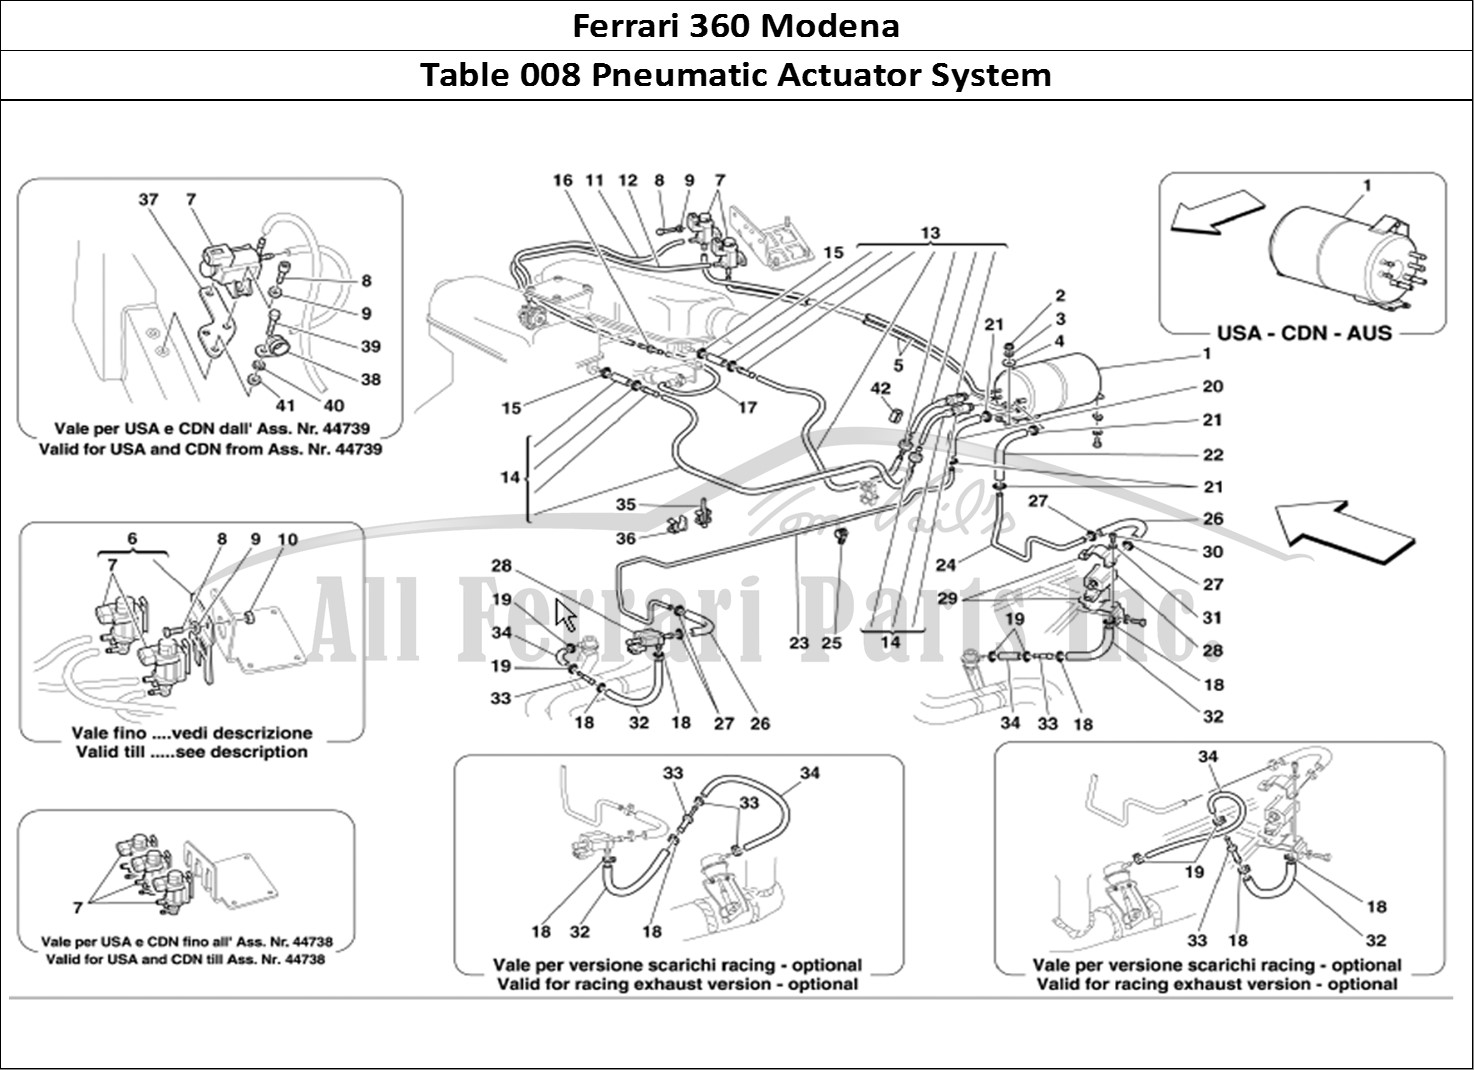 Buy Original Ferrari 360 Modena 008 Pneumatic Actuator